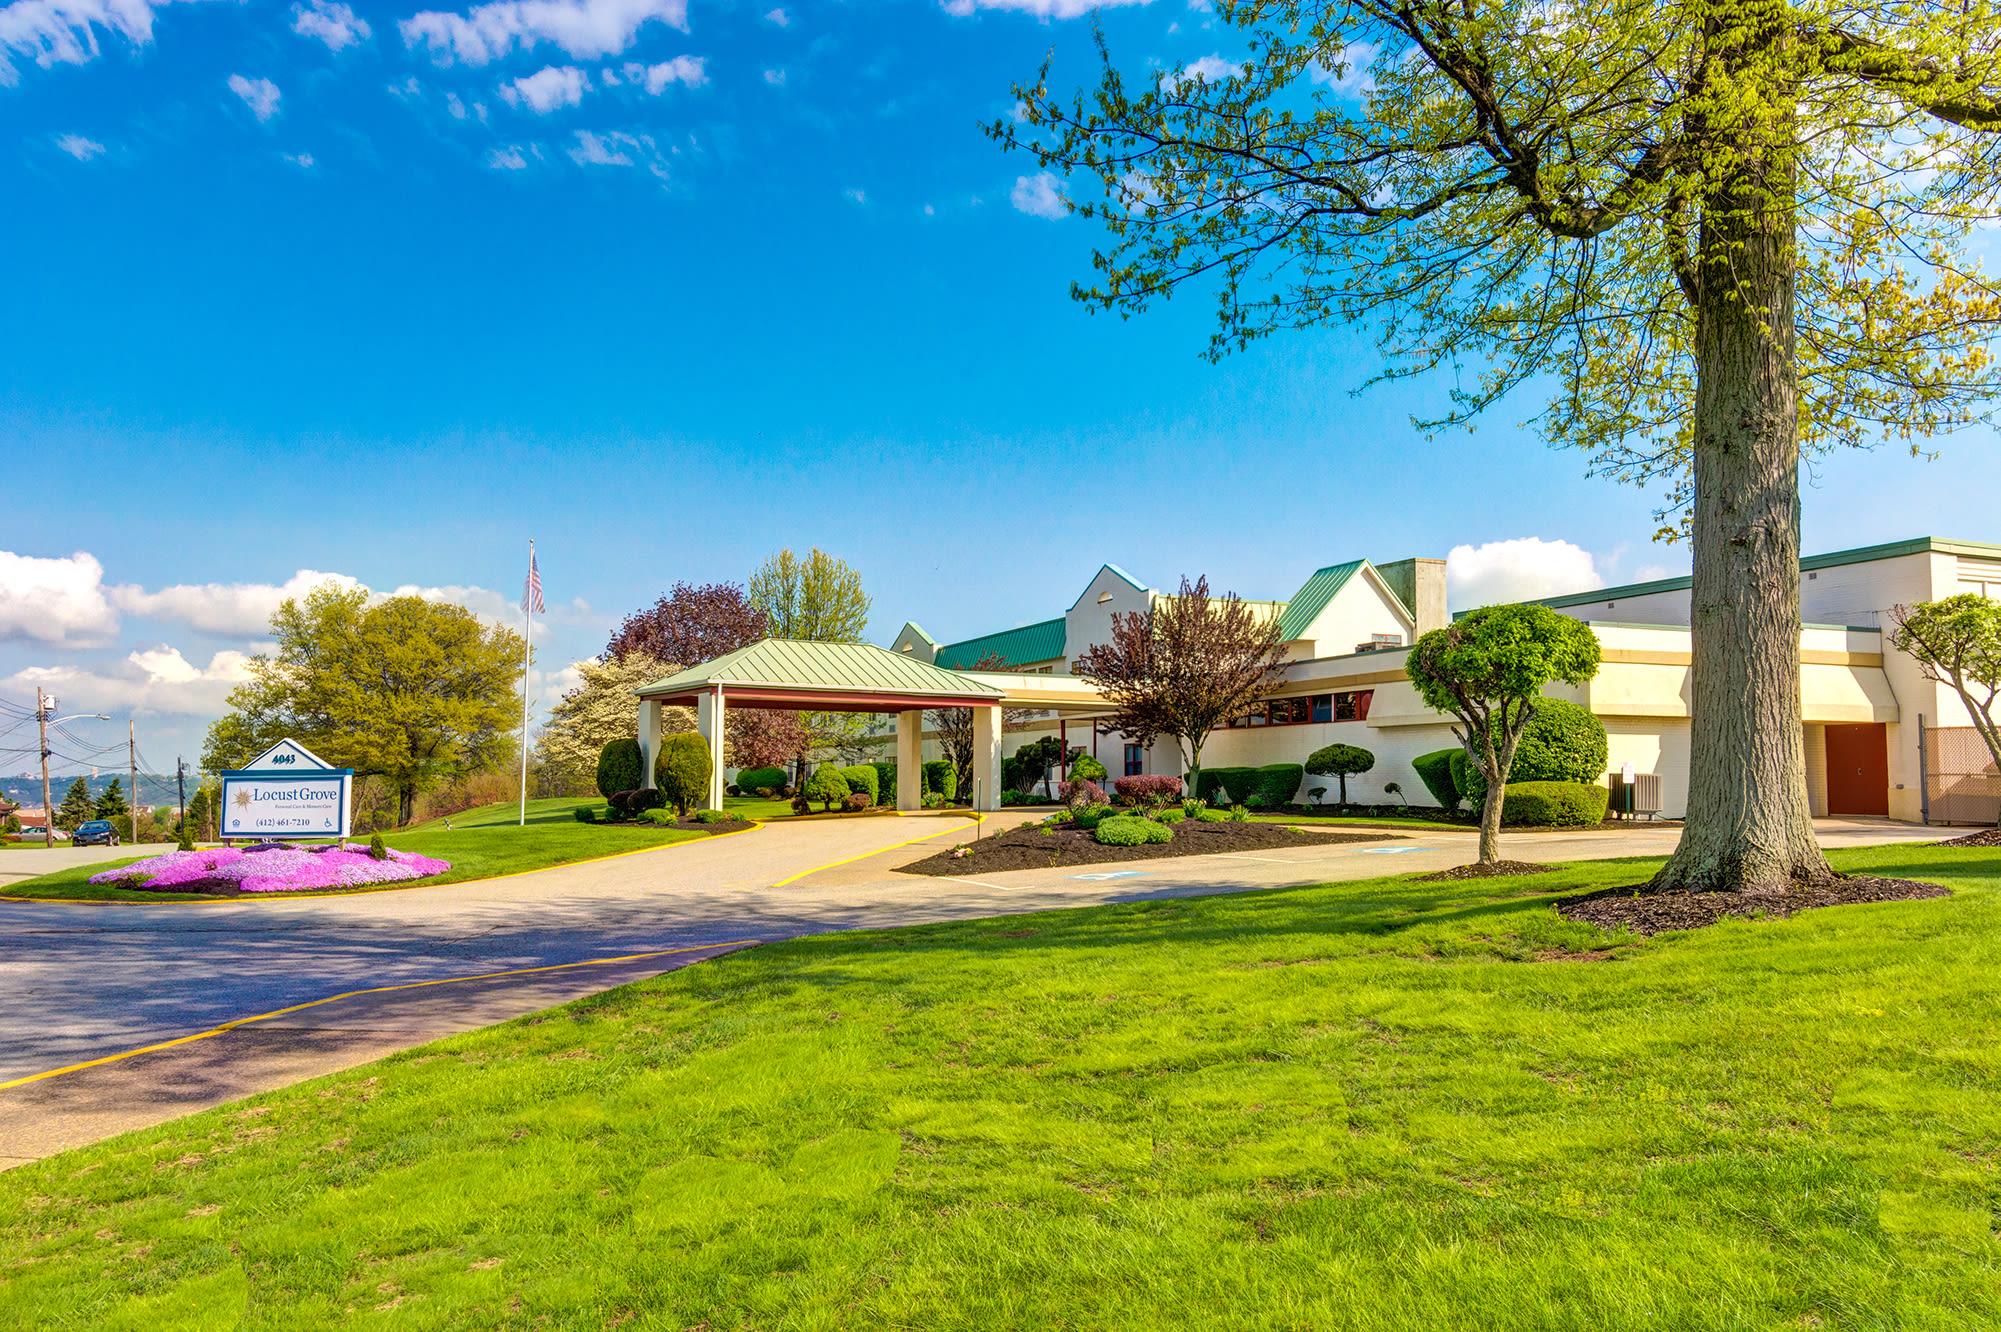 Senior living at Locust Grove Personal Care & Memory Care in West Mifflin, Pennsylvania